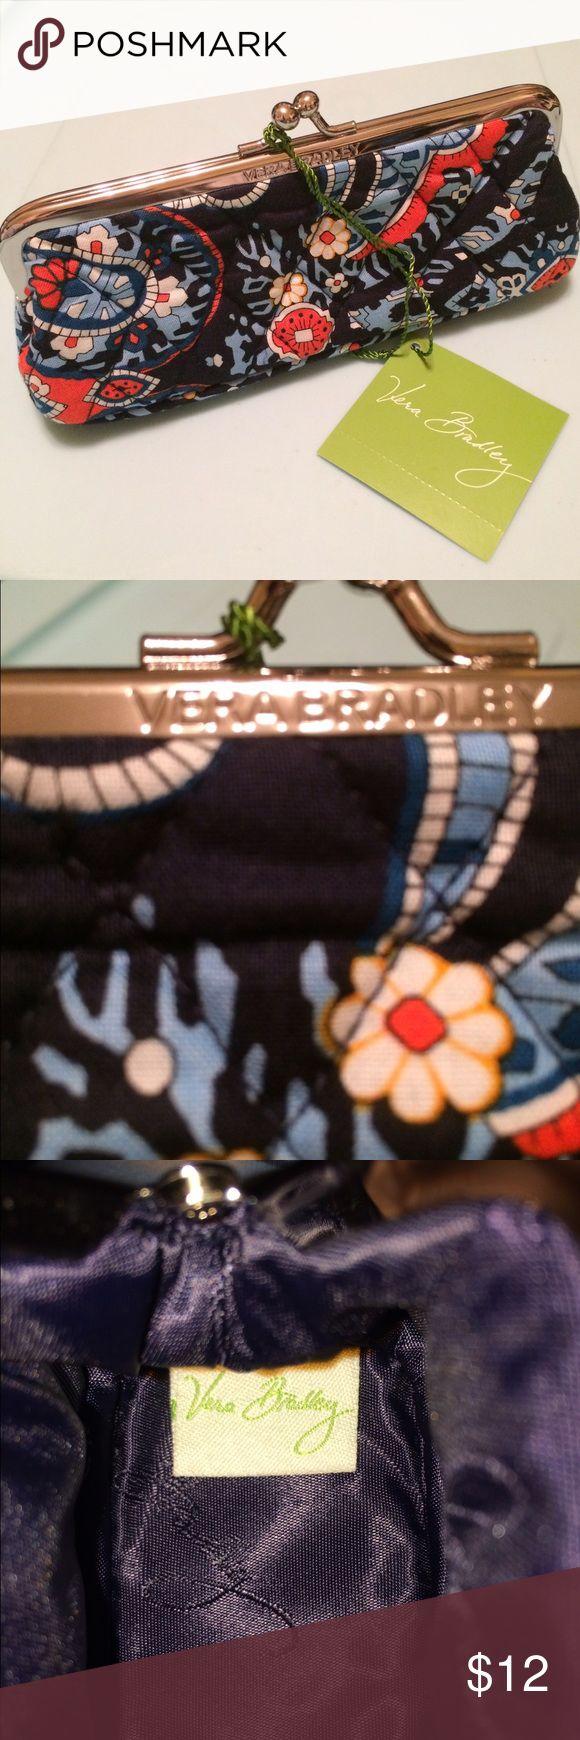 ‼️MONDAY SALE‼️ NWT Vera Bradley Kisslock Case NWT Vera Bradley Kisslock Case - Marrakesh Design Vera Bradley Bags Clutches & Wristlets